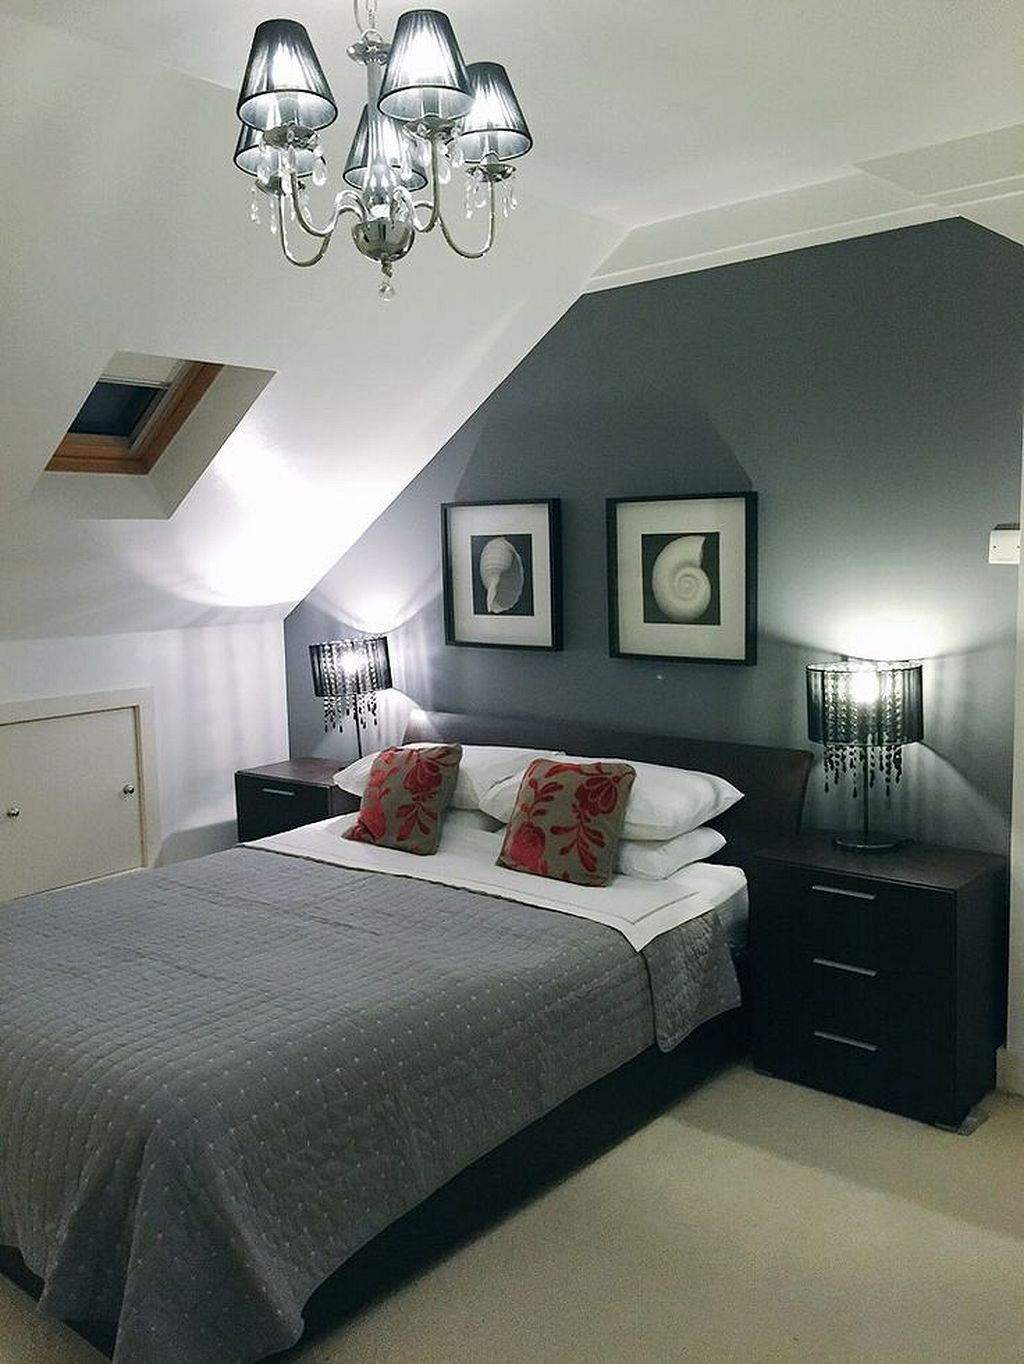 Adorable Inspiring Bedroom Design Ideas | Attic bedroom ... on Small Room Decor Ideas For Guys  id=88960